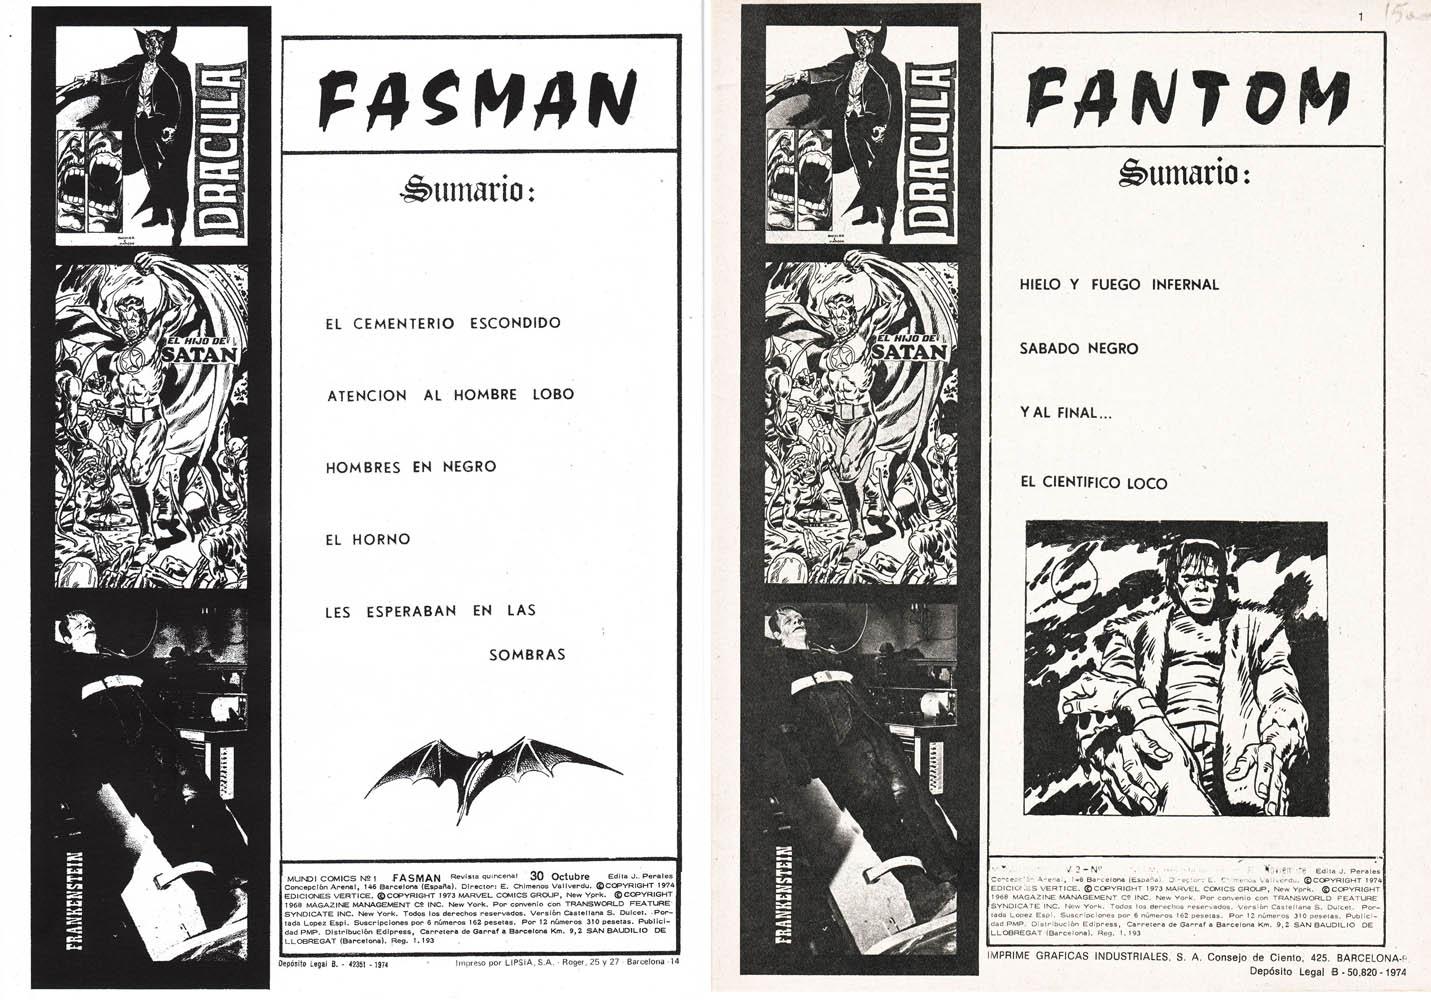 Sumario Fasman – Sumario Fantom